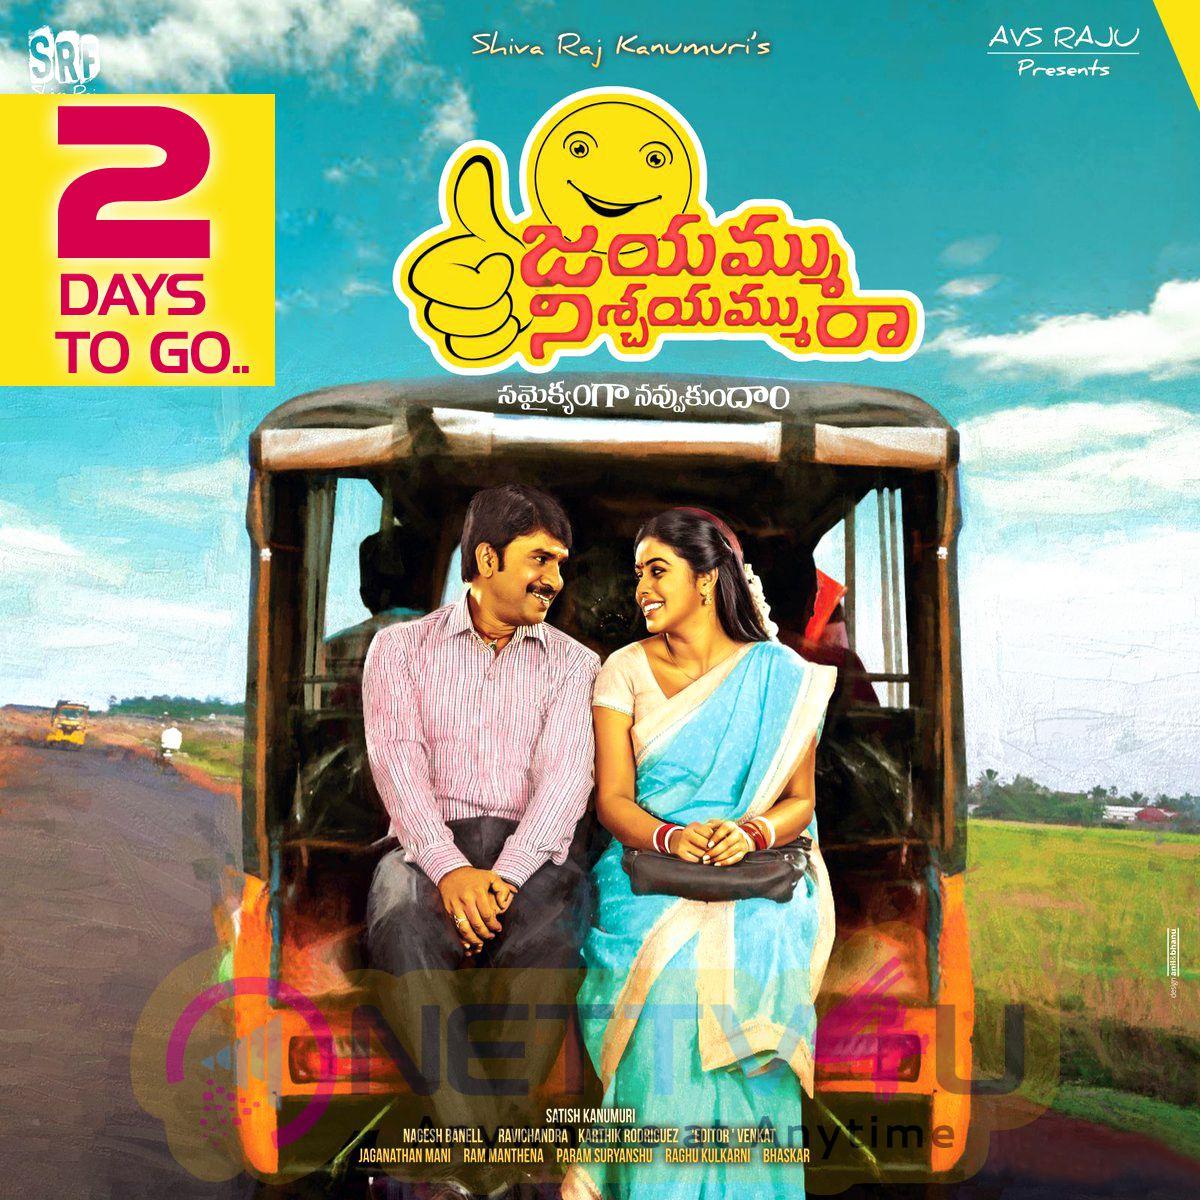 Jayammu Nischayammura Telugu Movie 2 Days To Go Posters